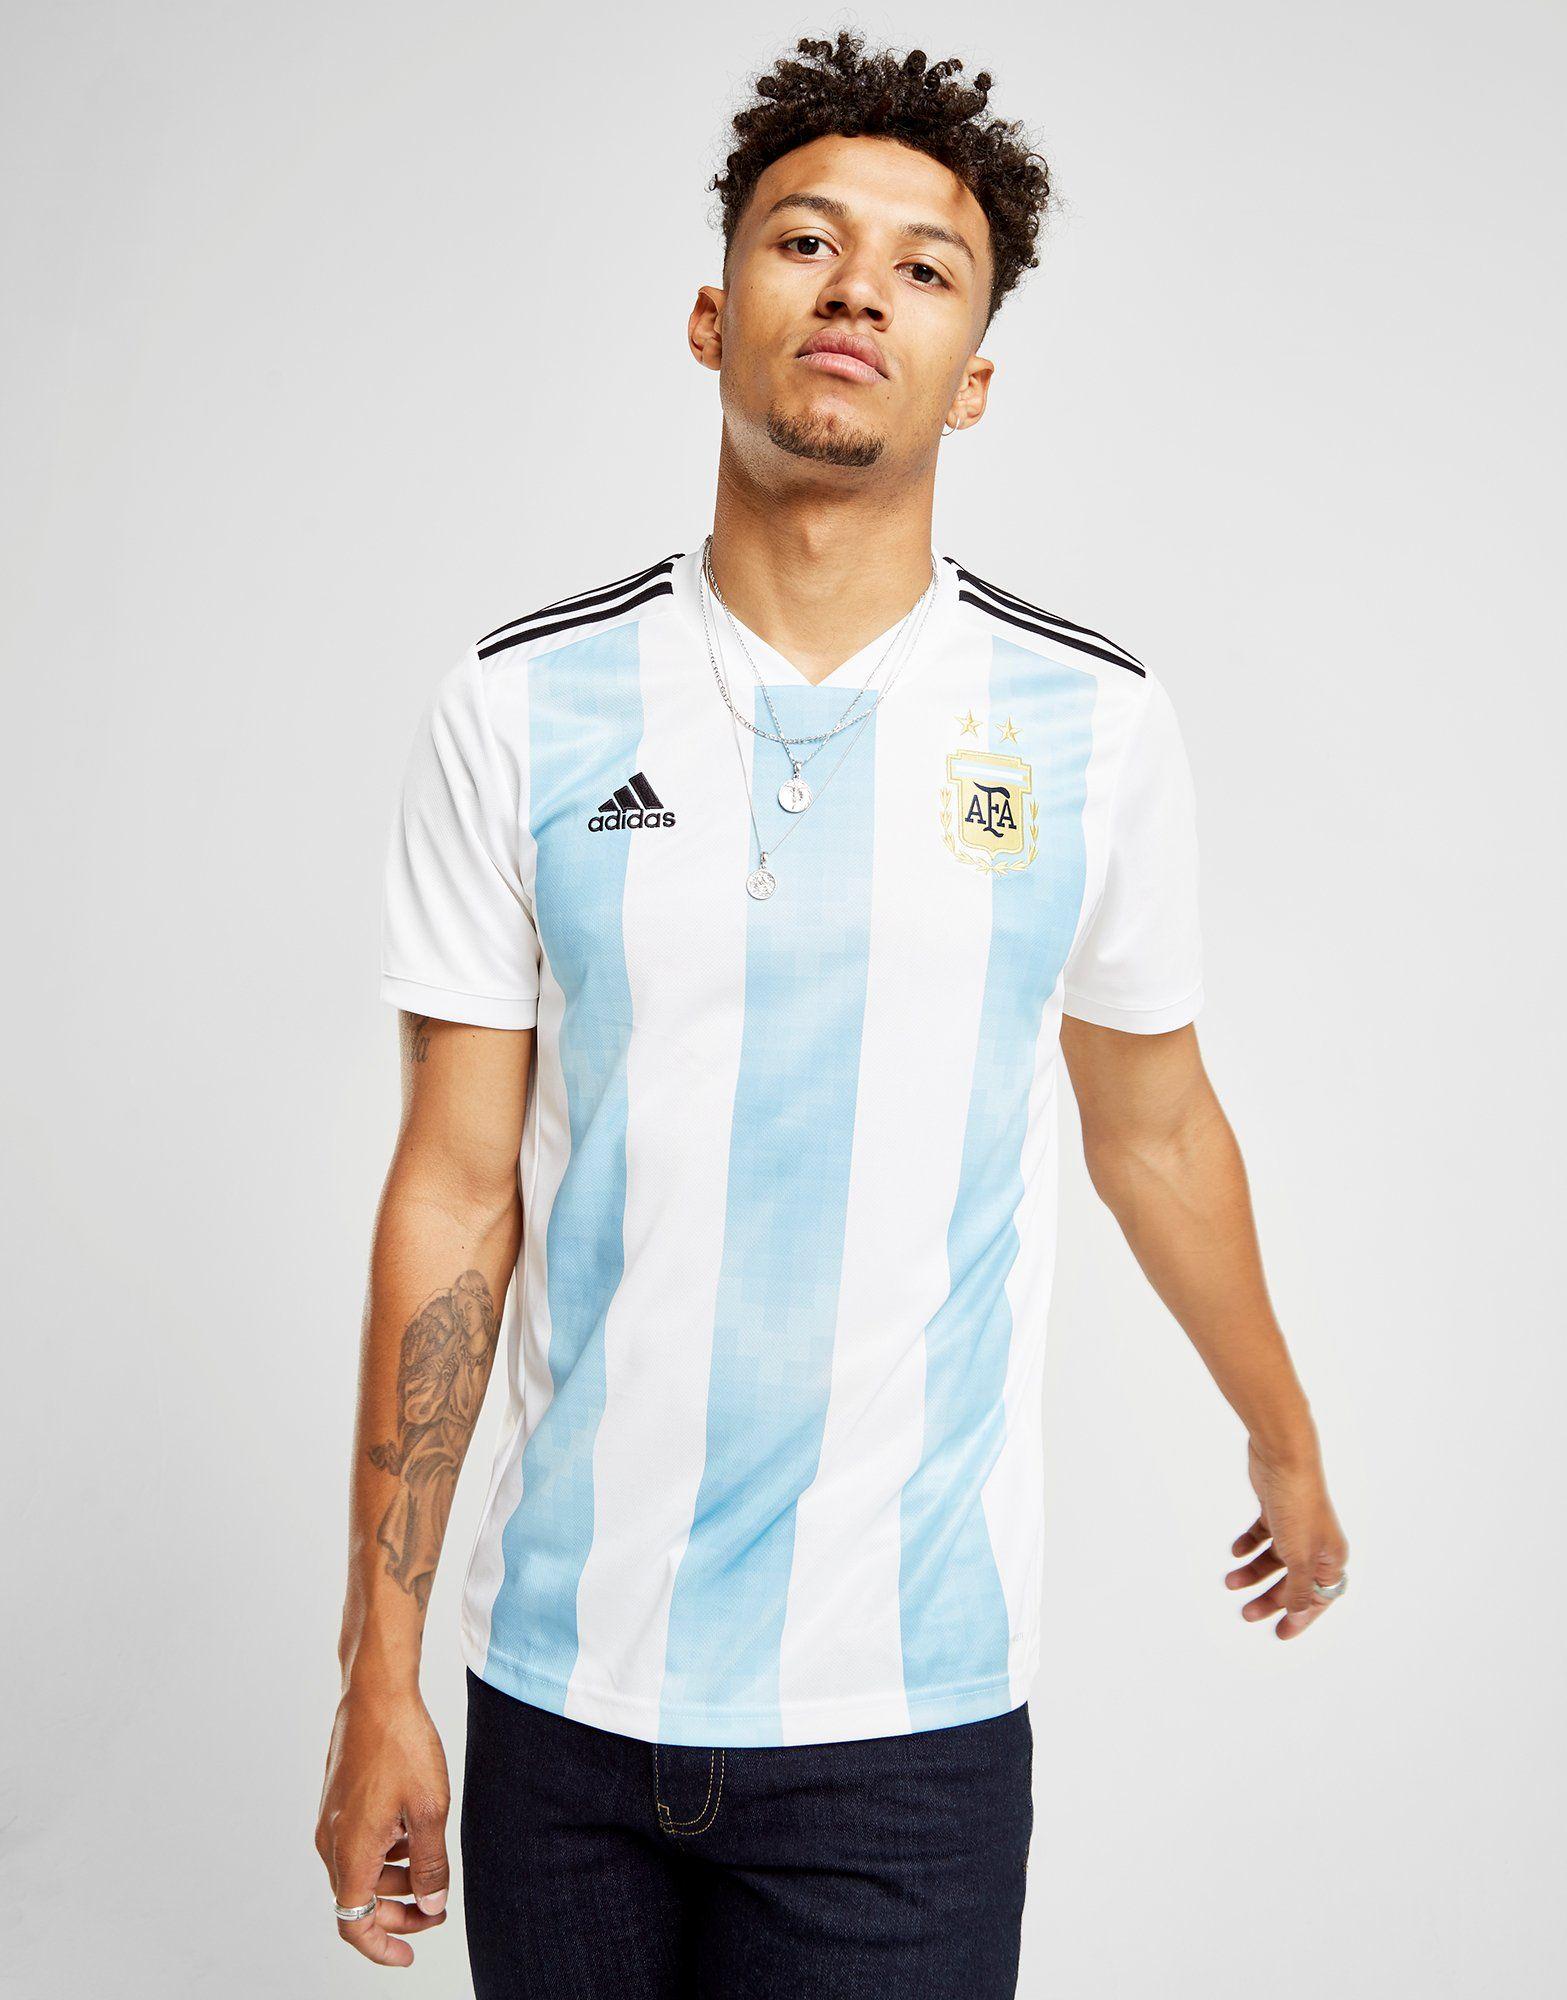 adidas Argentina 2017/18 Home Shirt